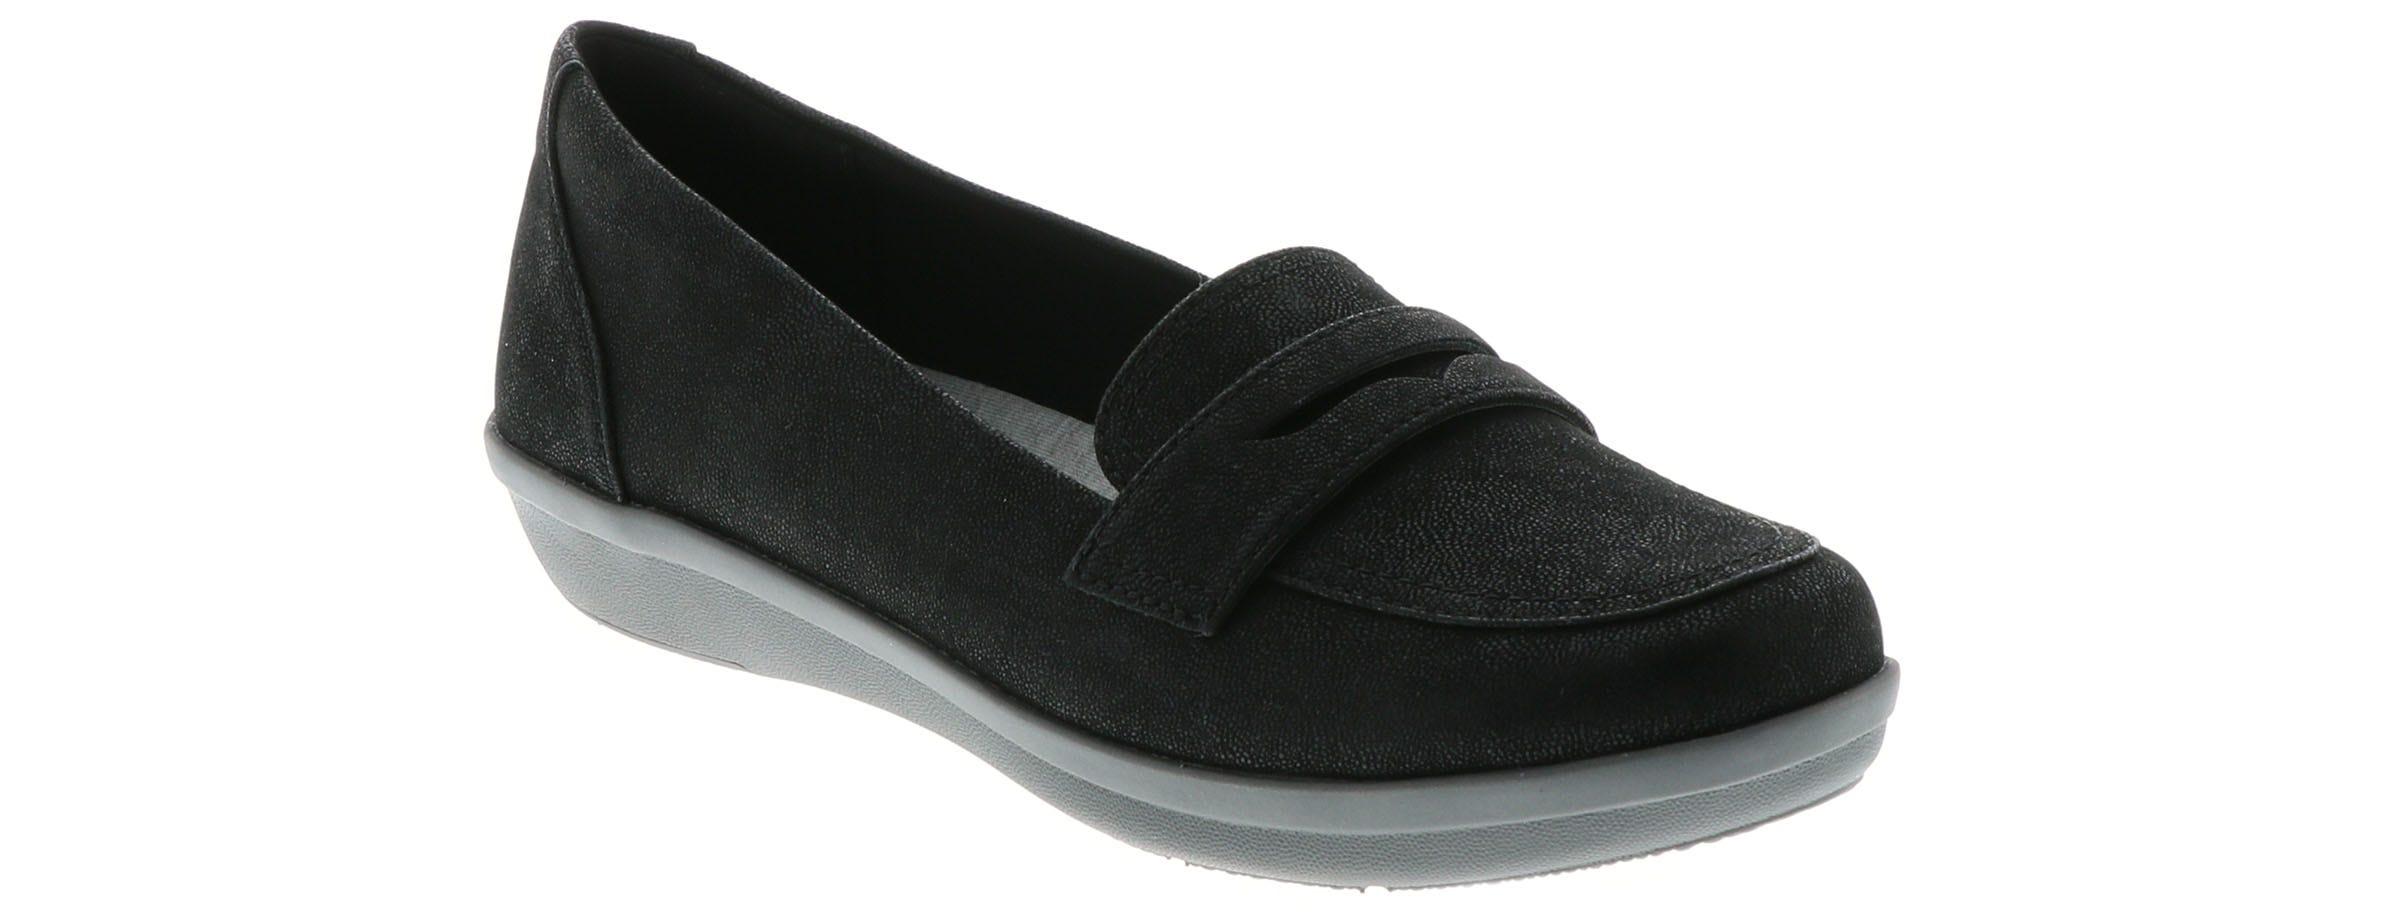 70cee488f13a8 Women's Clarks Ayla Form Black   Shoe Sensation